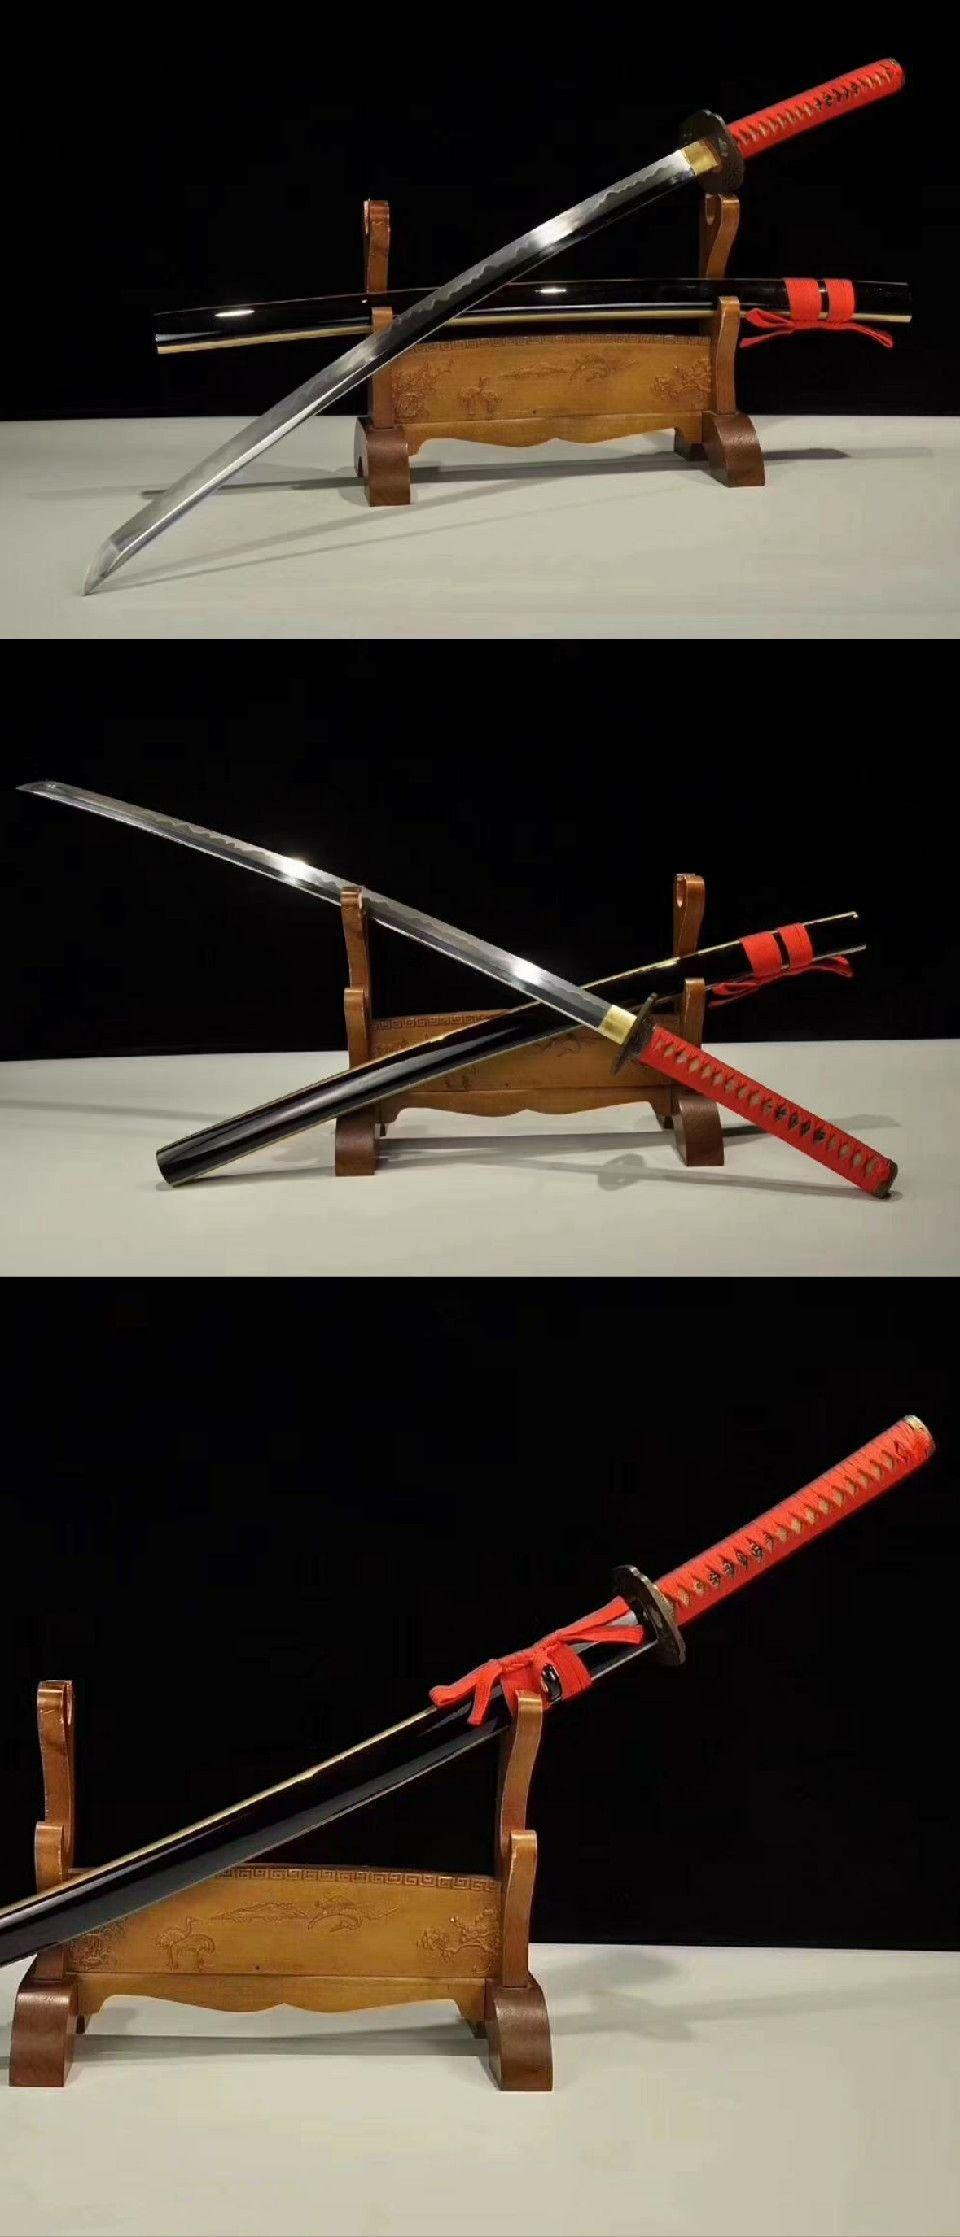 samurai sword,cold weapon